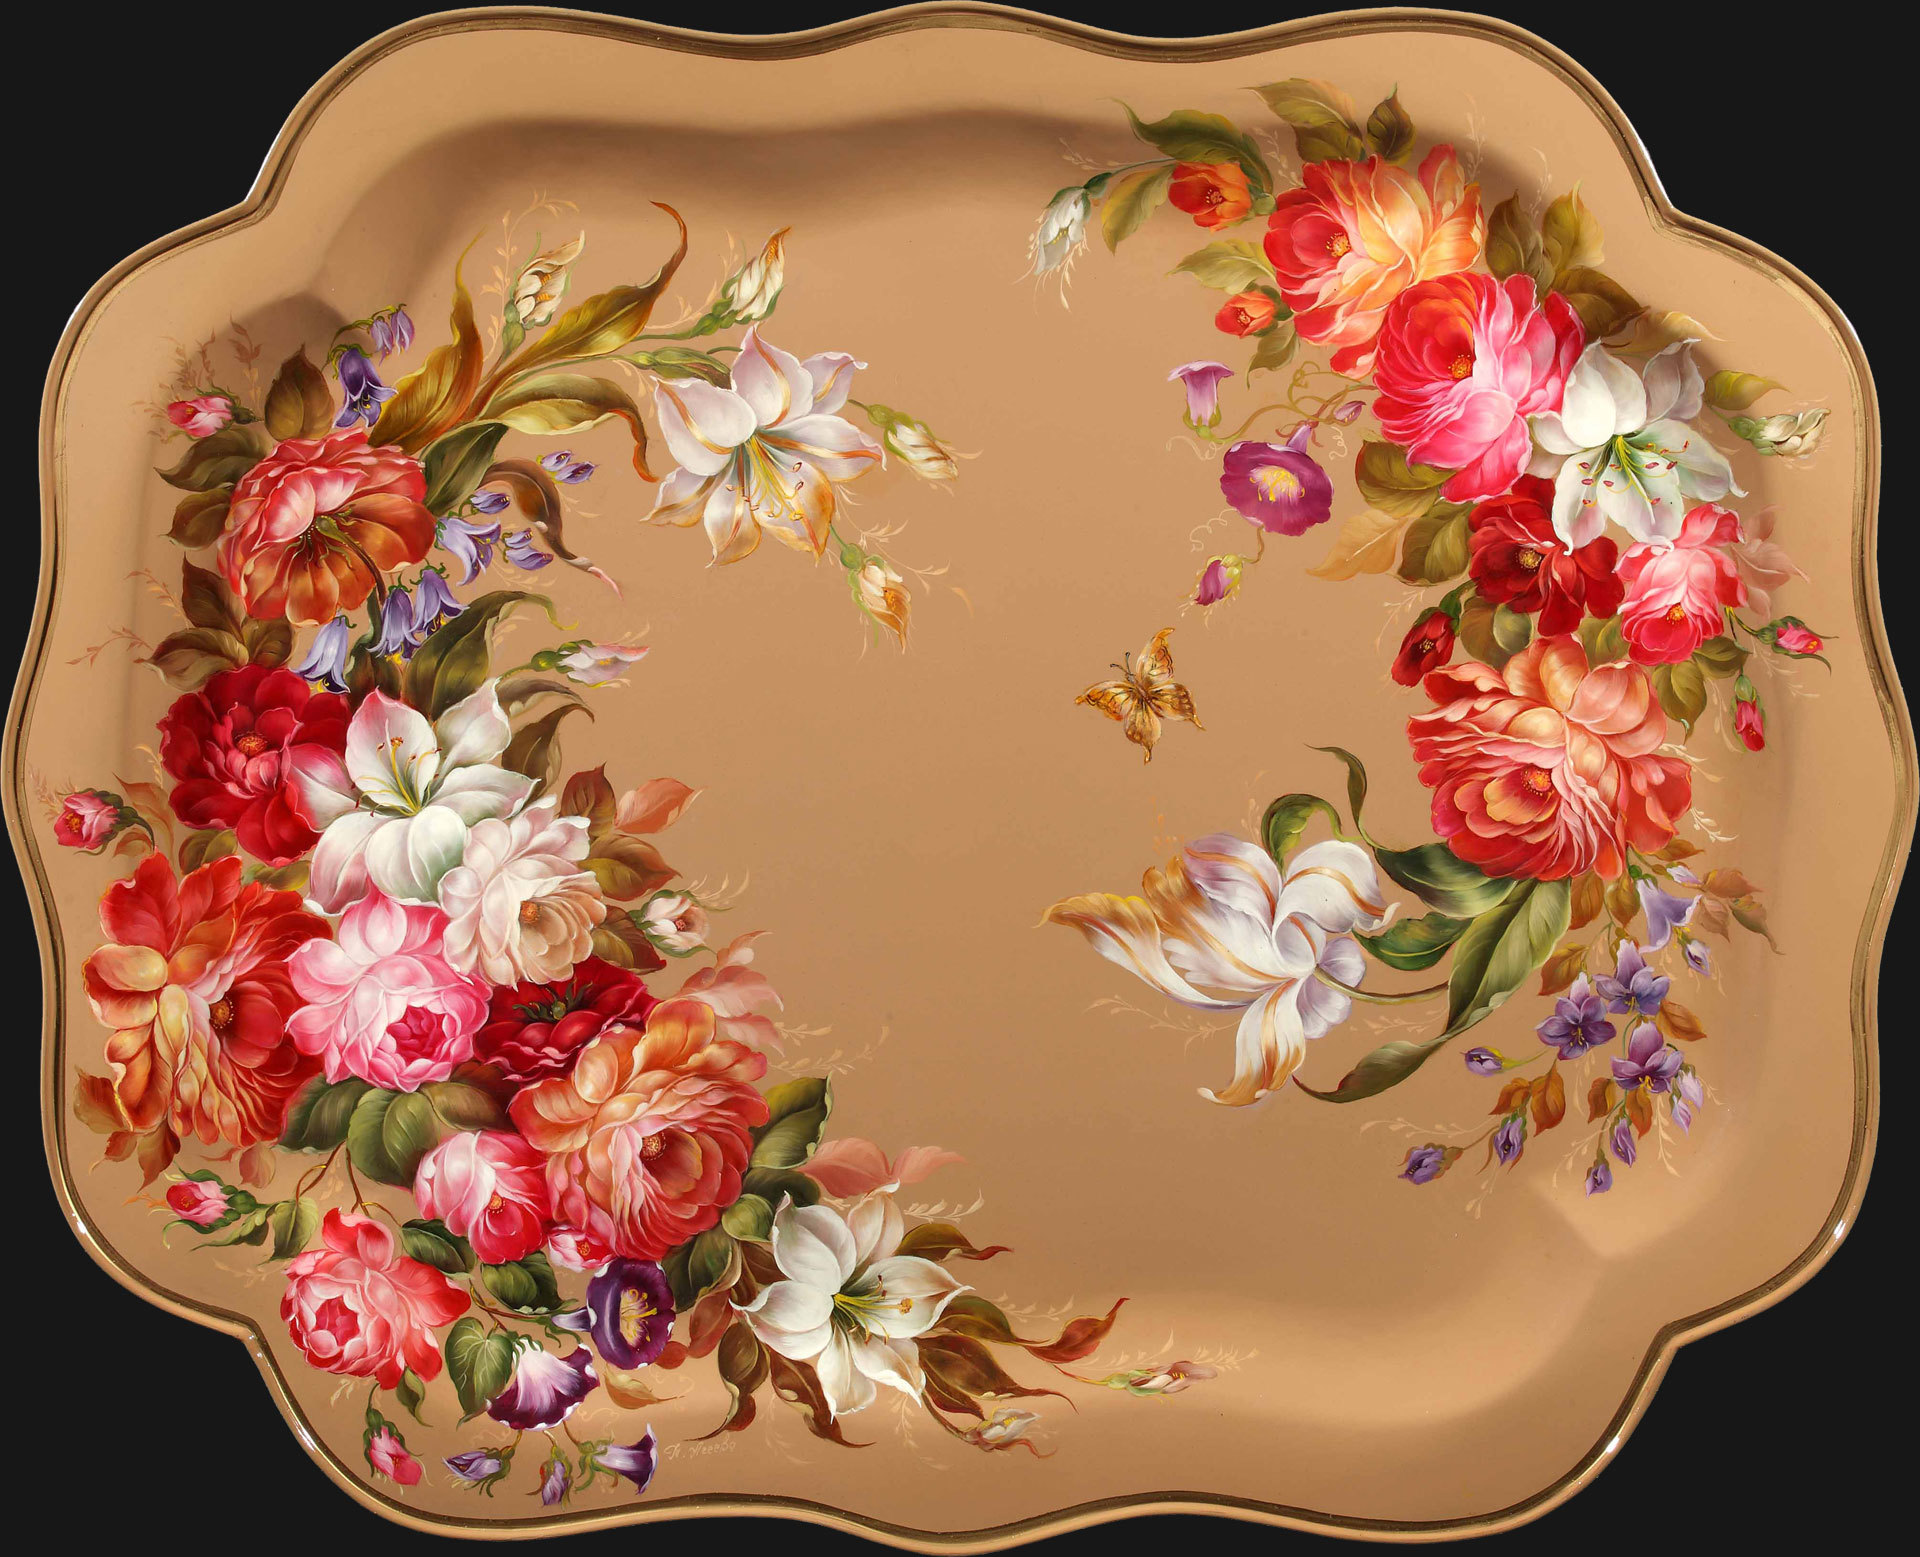 Flowers garland